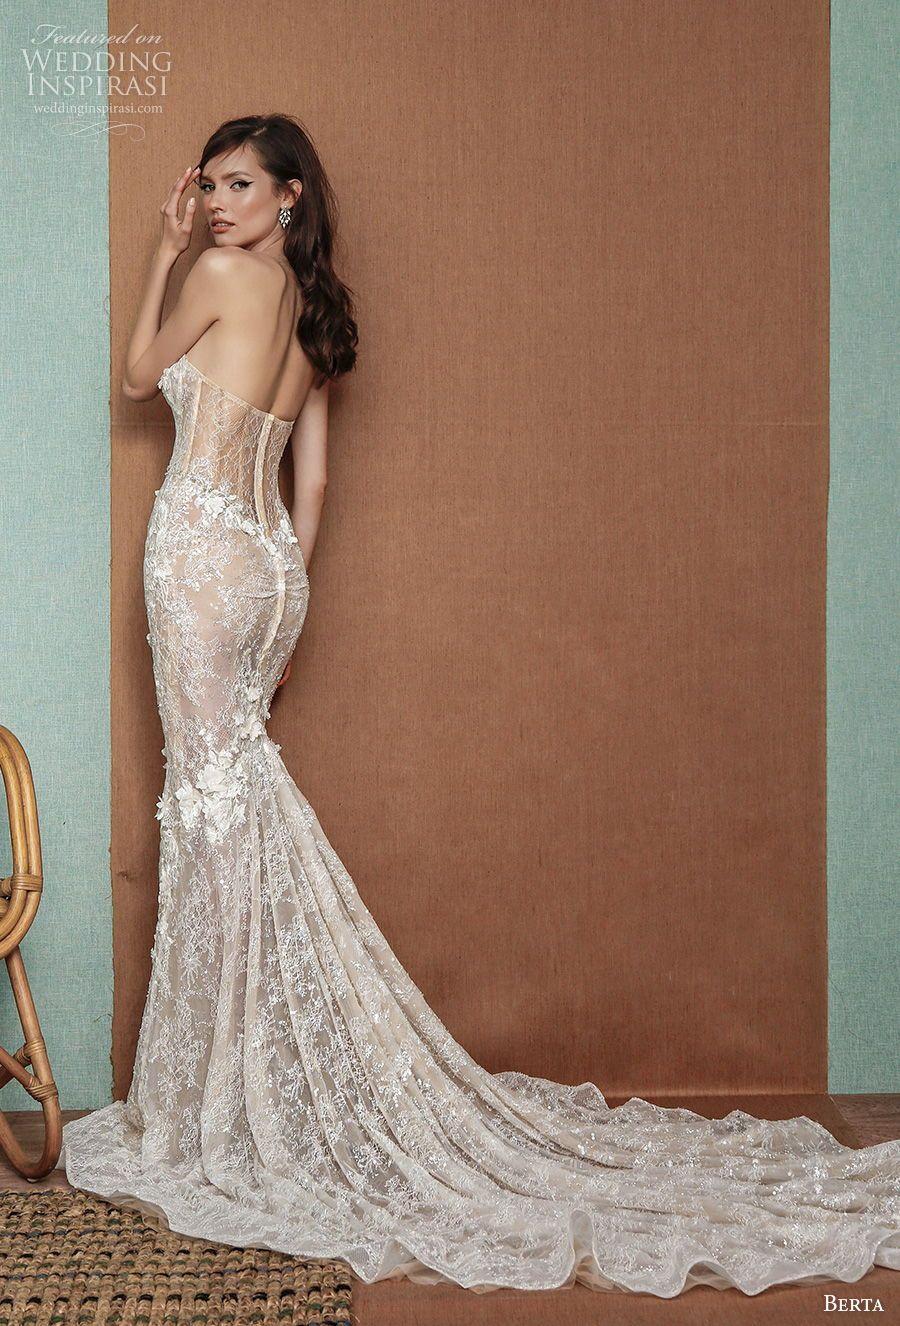 Pronovias Vela In 2021 Corset Mermaid Wedding Dress Bodice Wedding Dress Bridal Dresses [ 2255 x 1691 Pixel ]